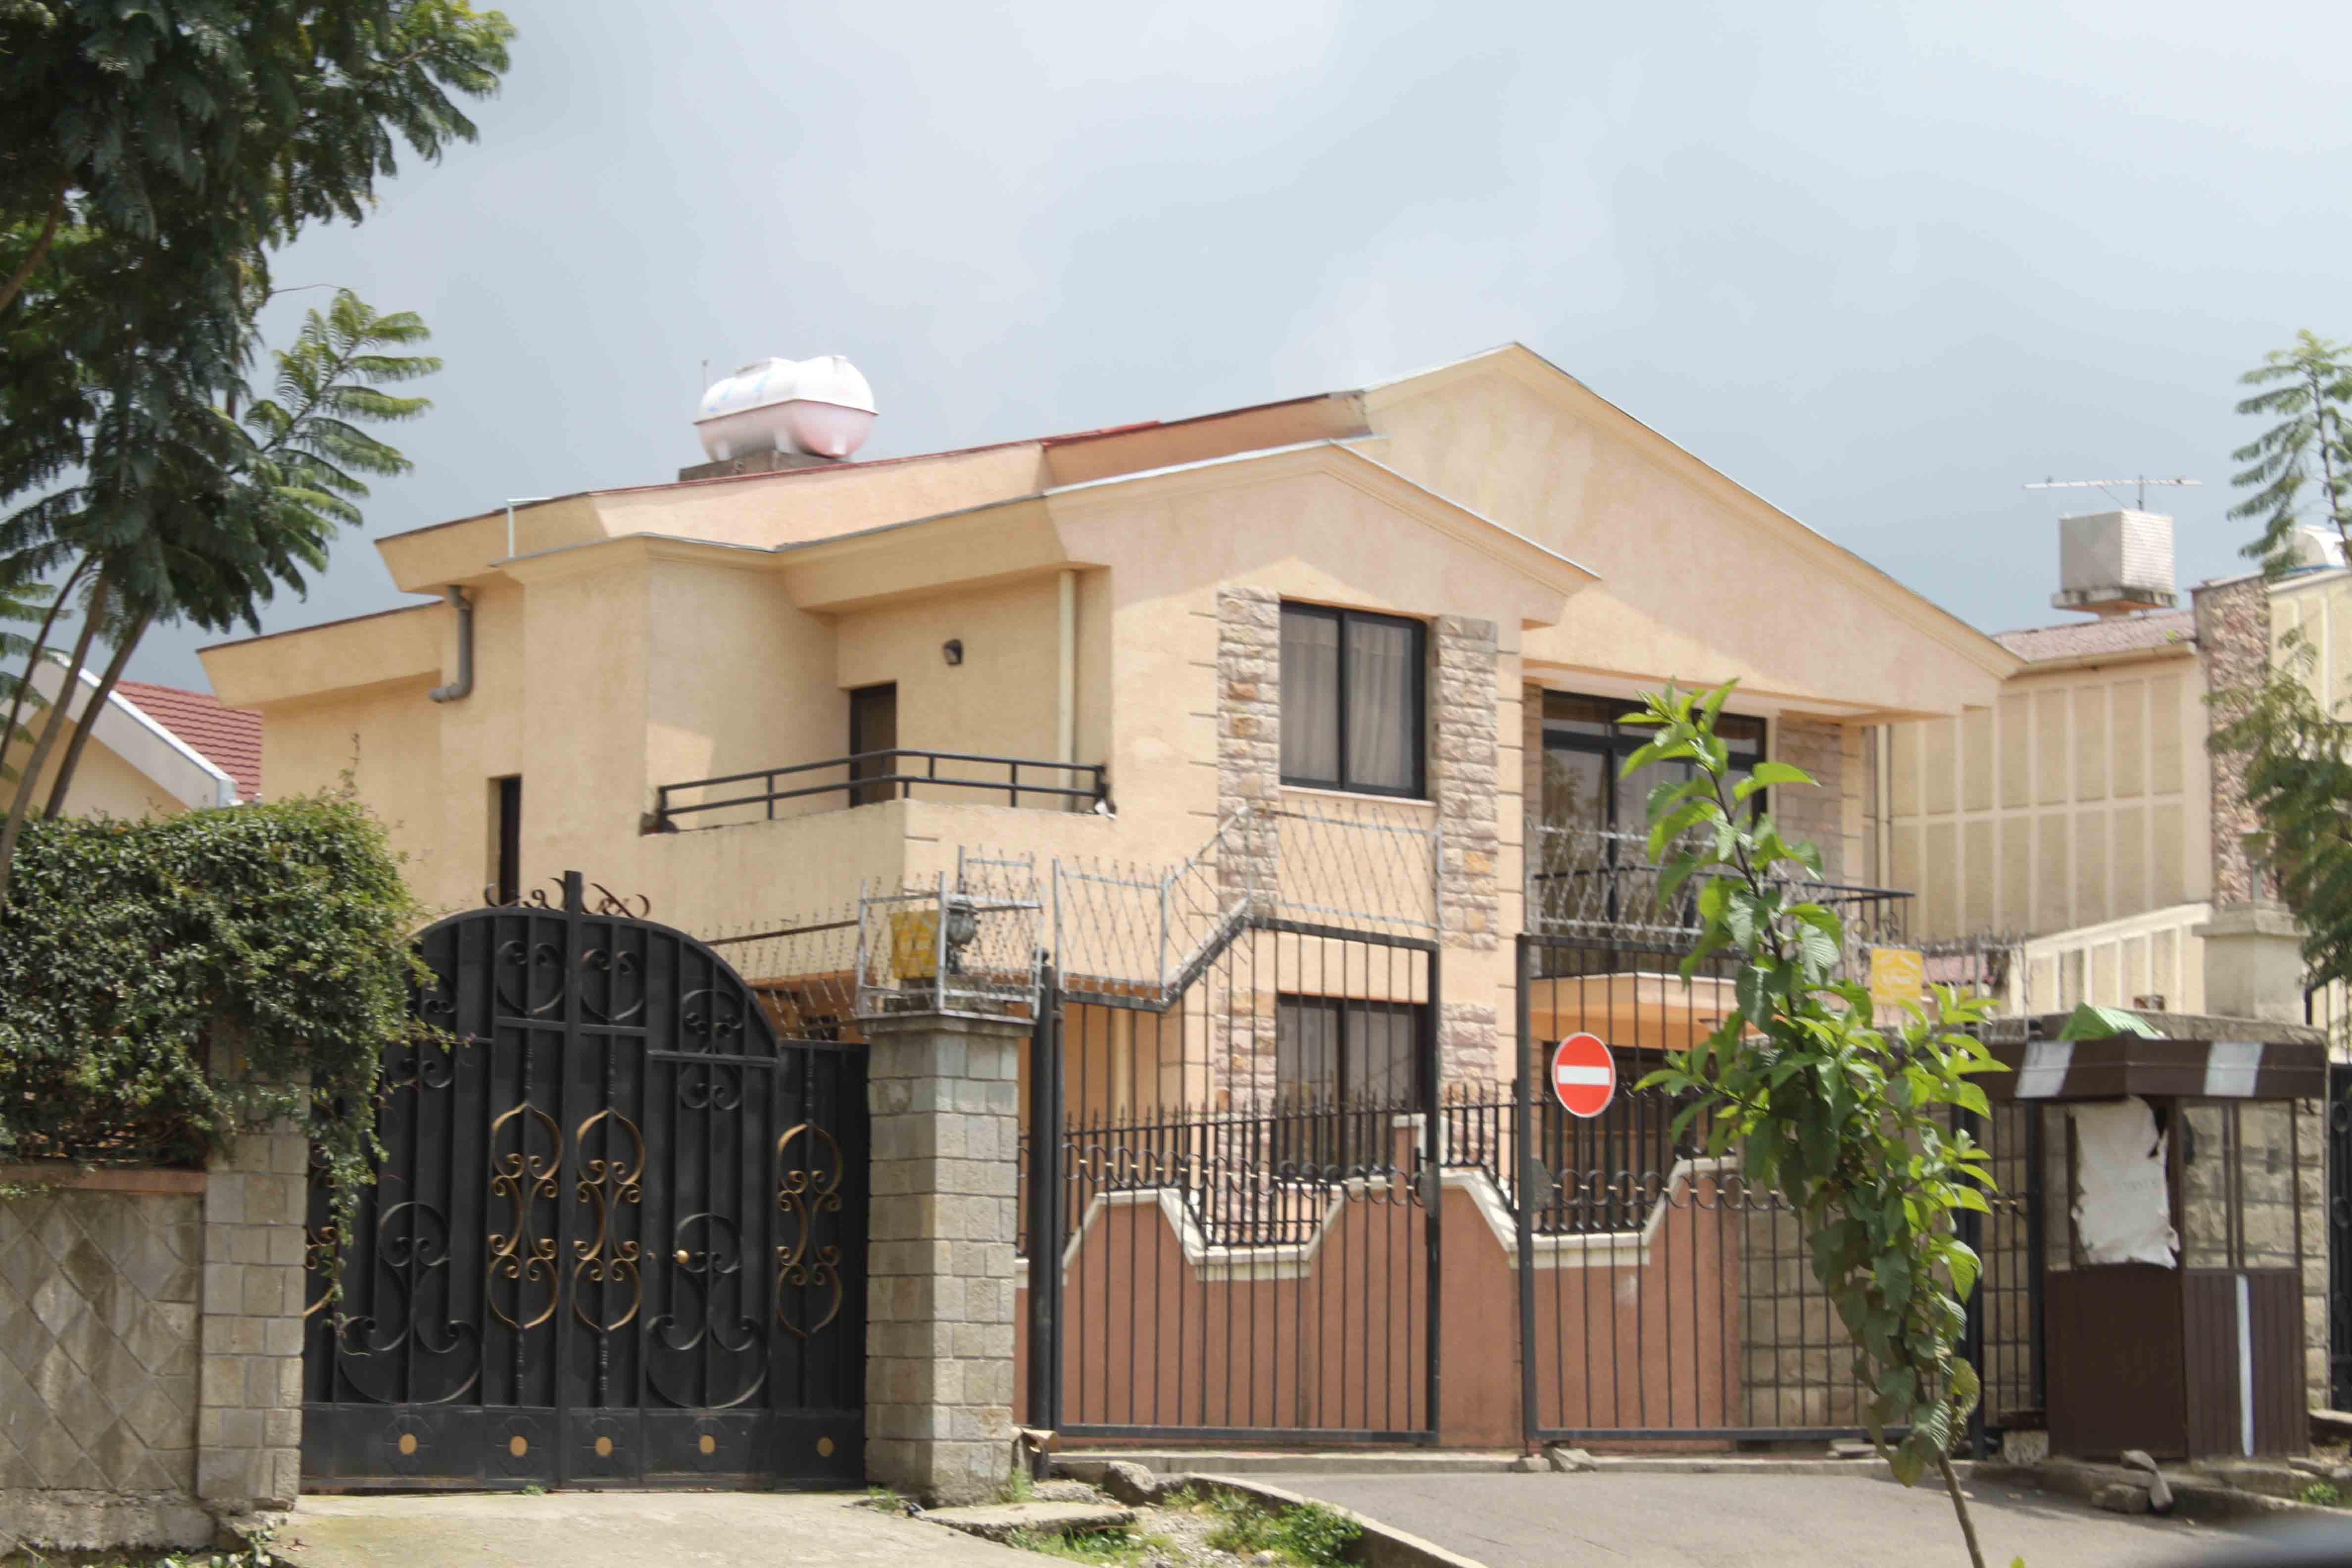 9OX8oacGCR C7x1TNqnEB9qMTaXZwrj0wH3sLURYqoBHvWLWZye884ElDyBS1bq 91LpnYTpXcYr0e451VcJB3g7sCDTDv1zaY0Moc0Q6L34O6evTxGglZ7 EUgAN13F=s0 d - Download Modern 3 Bedroom House Plans In Kenya PNG